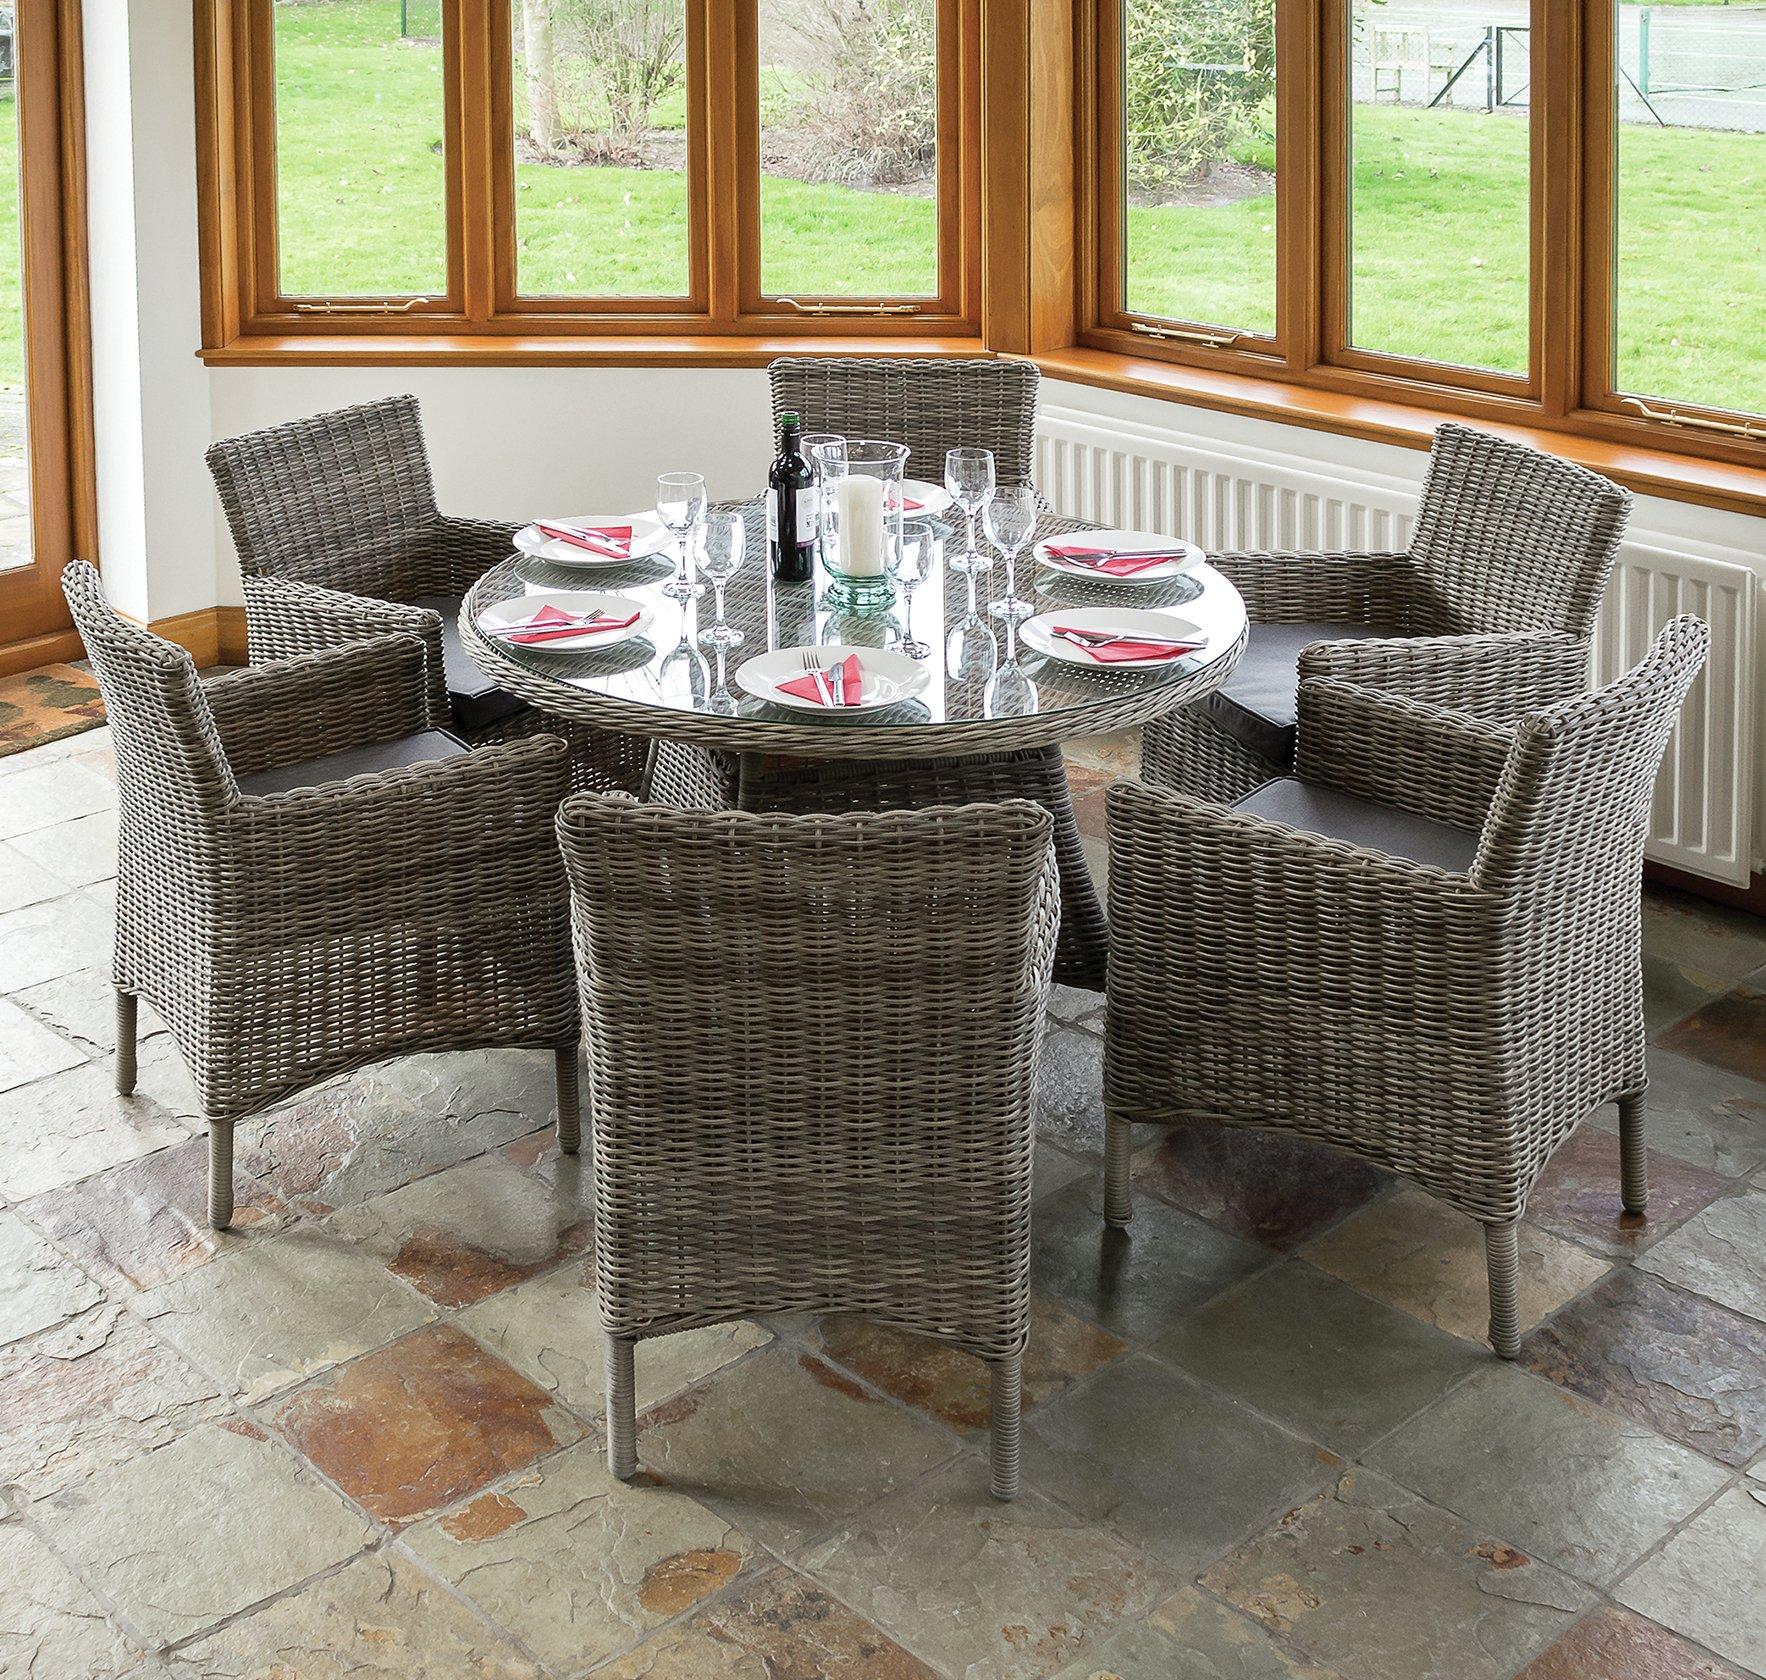 Buy Richmond Rattan Garden Dining Set with 6 Chairs at Argoscouk